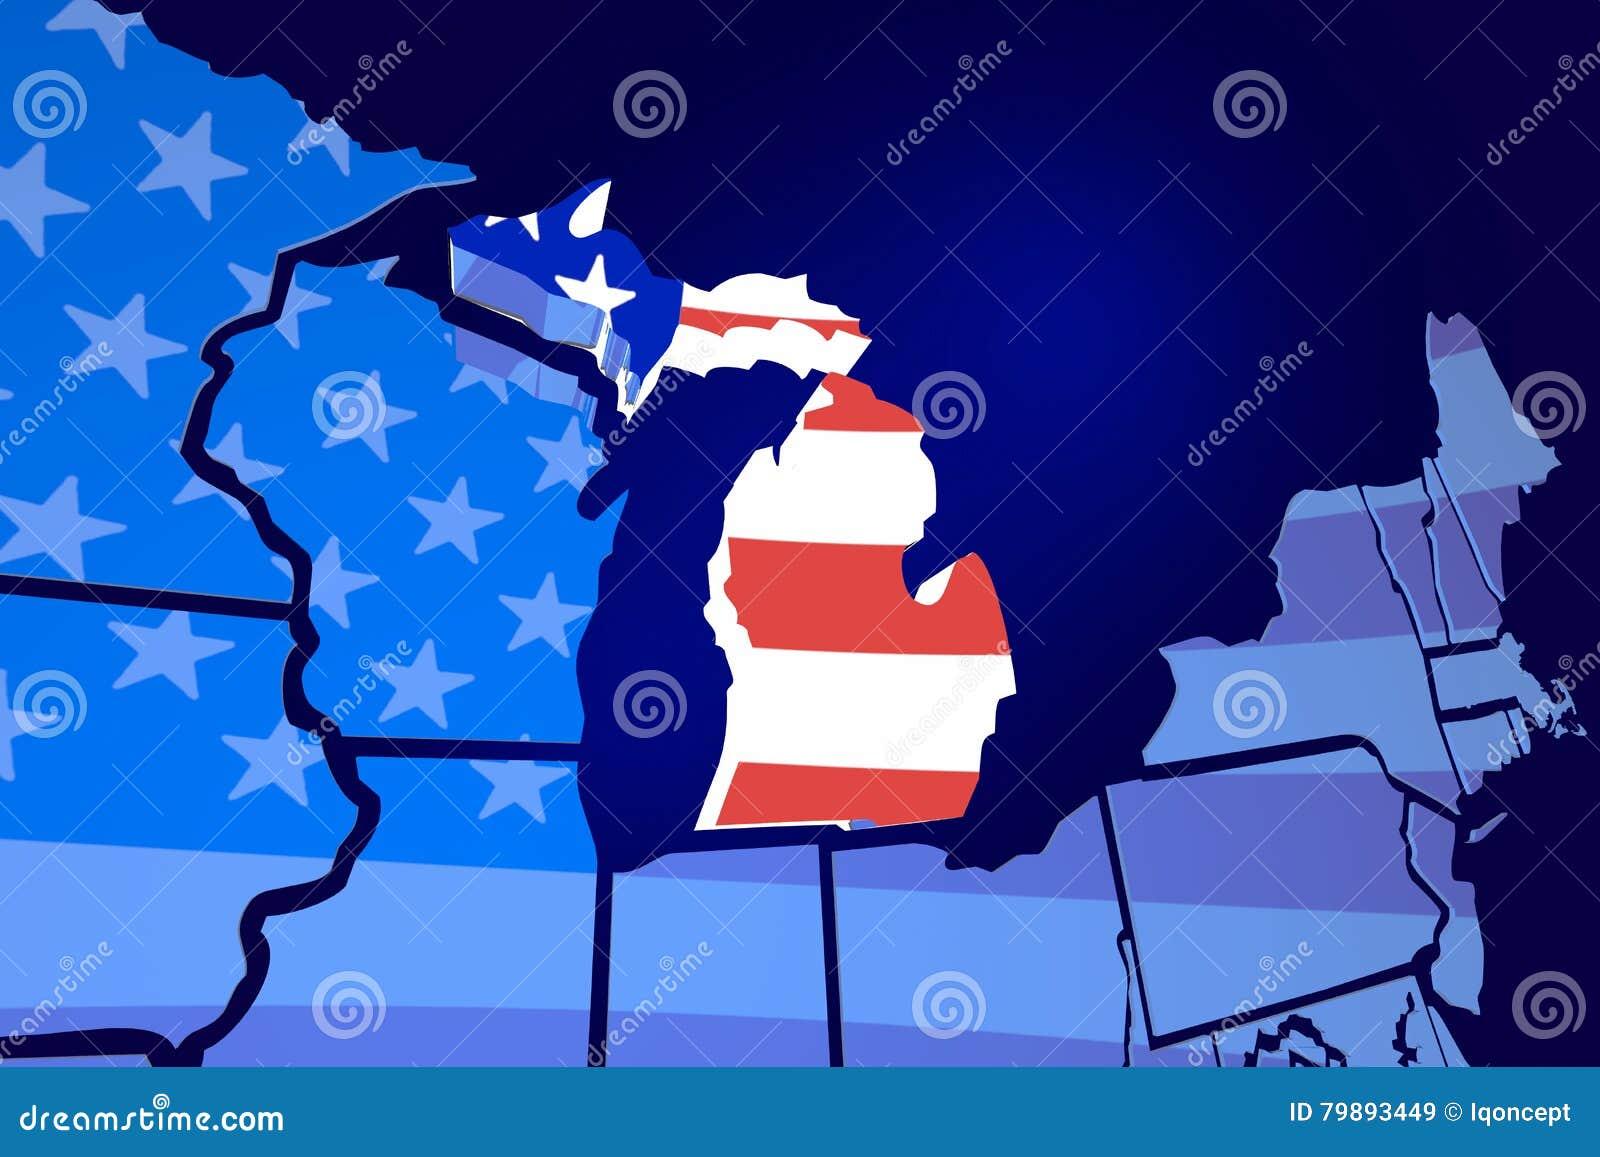 Michigan State Map USA United States America Flag Stock - Michigan state map usa